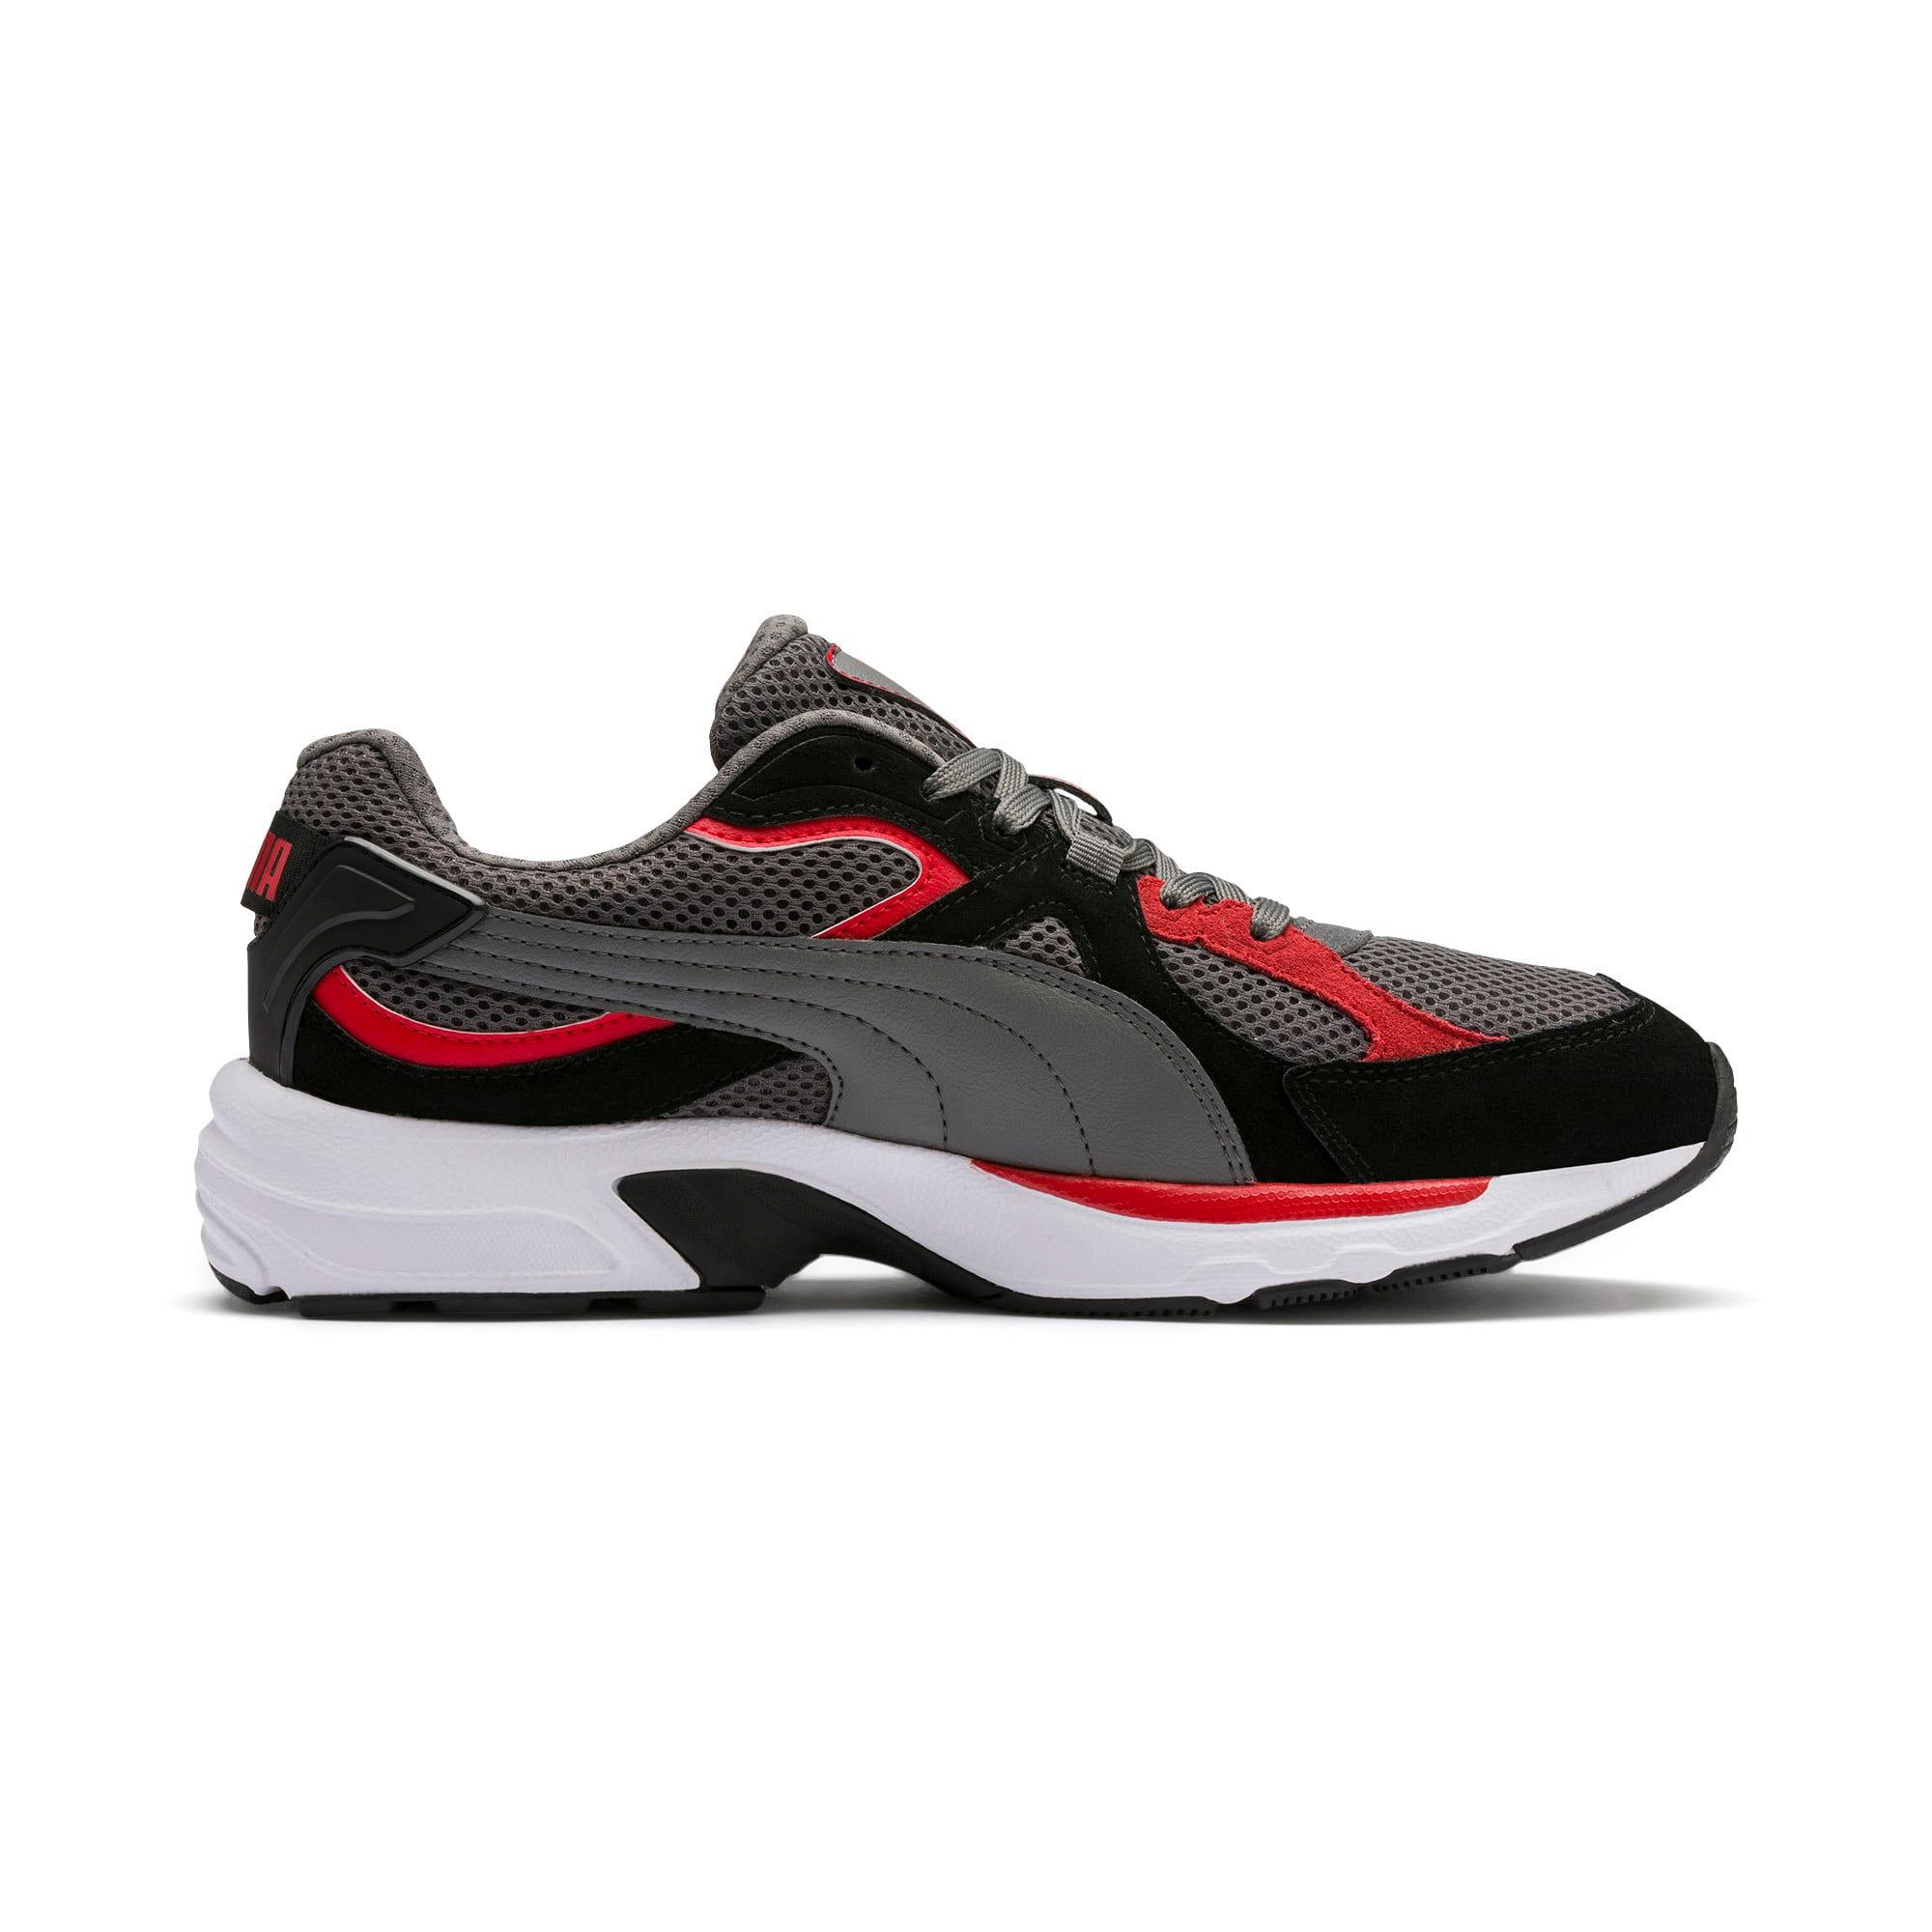 Thumbnail 6 of Axis Plus SD sneakers, CASTLEROCK-Black-Red-White, medium